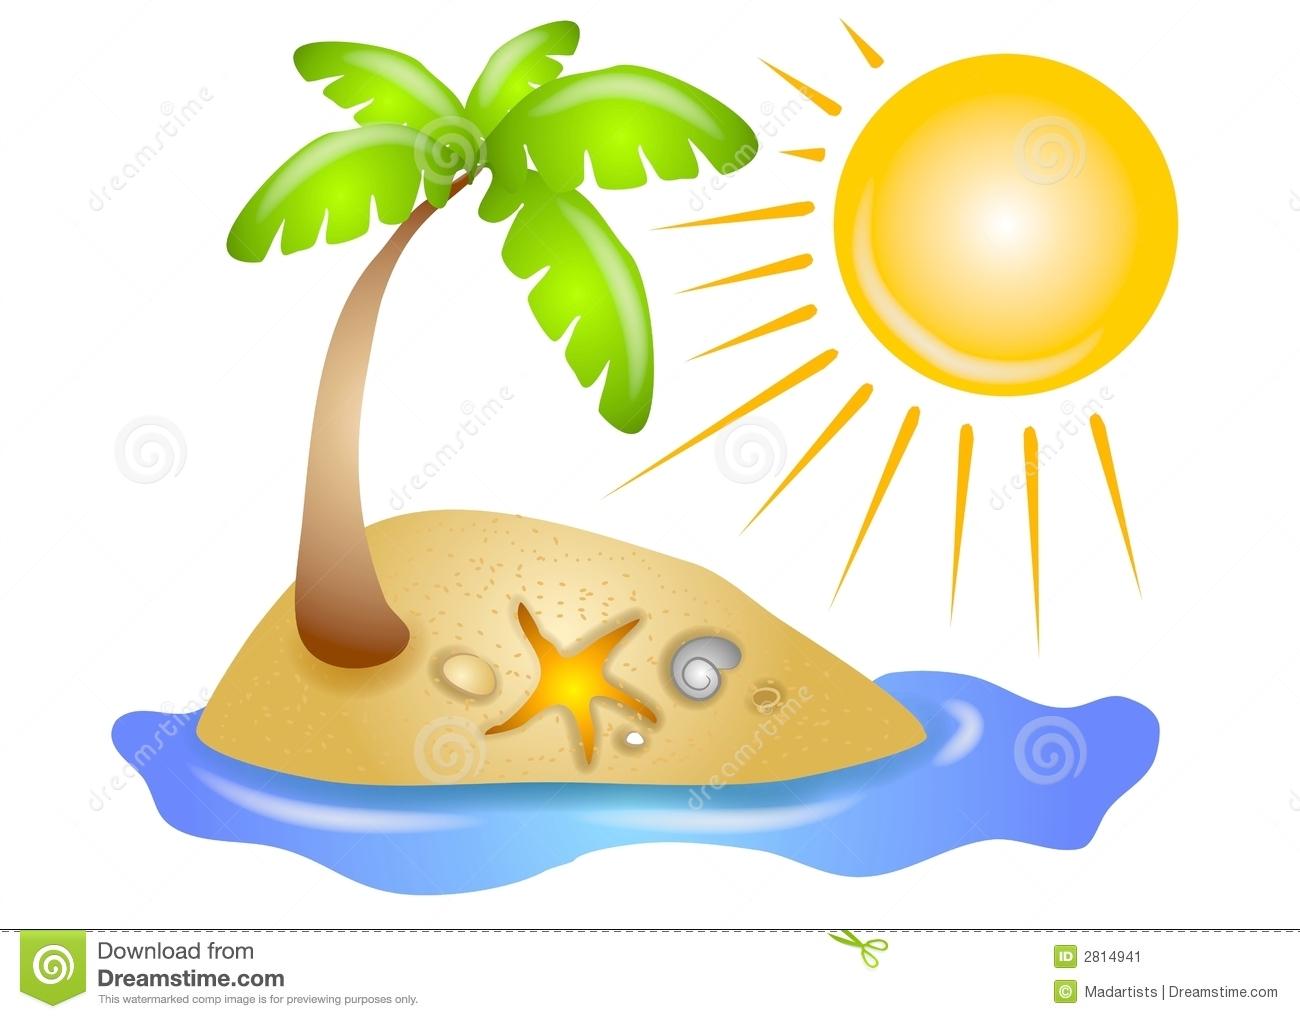 Tree Ona Deserted Island With Beach Shel-Tree Ona Deserted Island With Beach Shells Water And A Glowing Sun-17